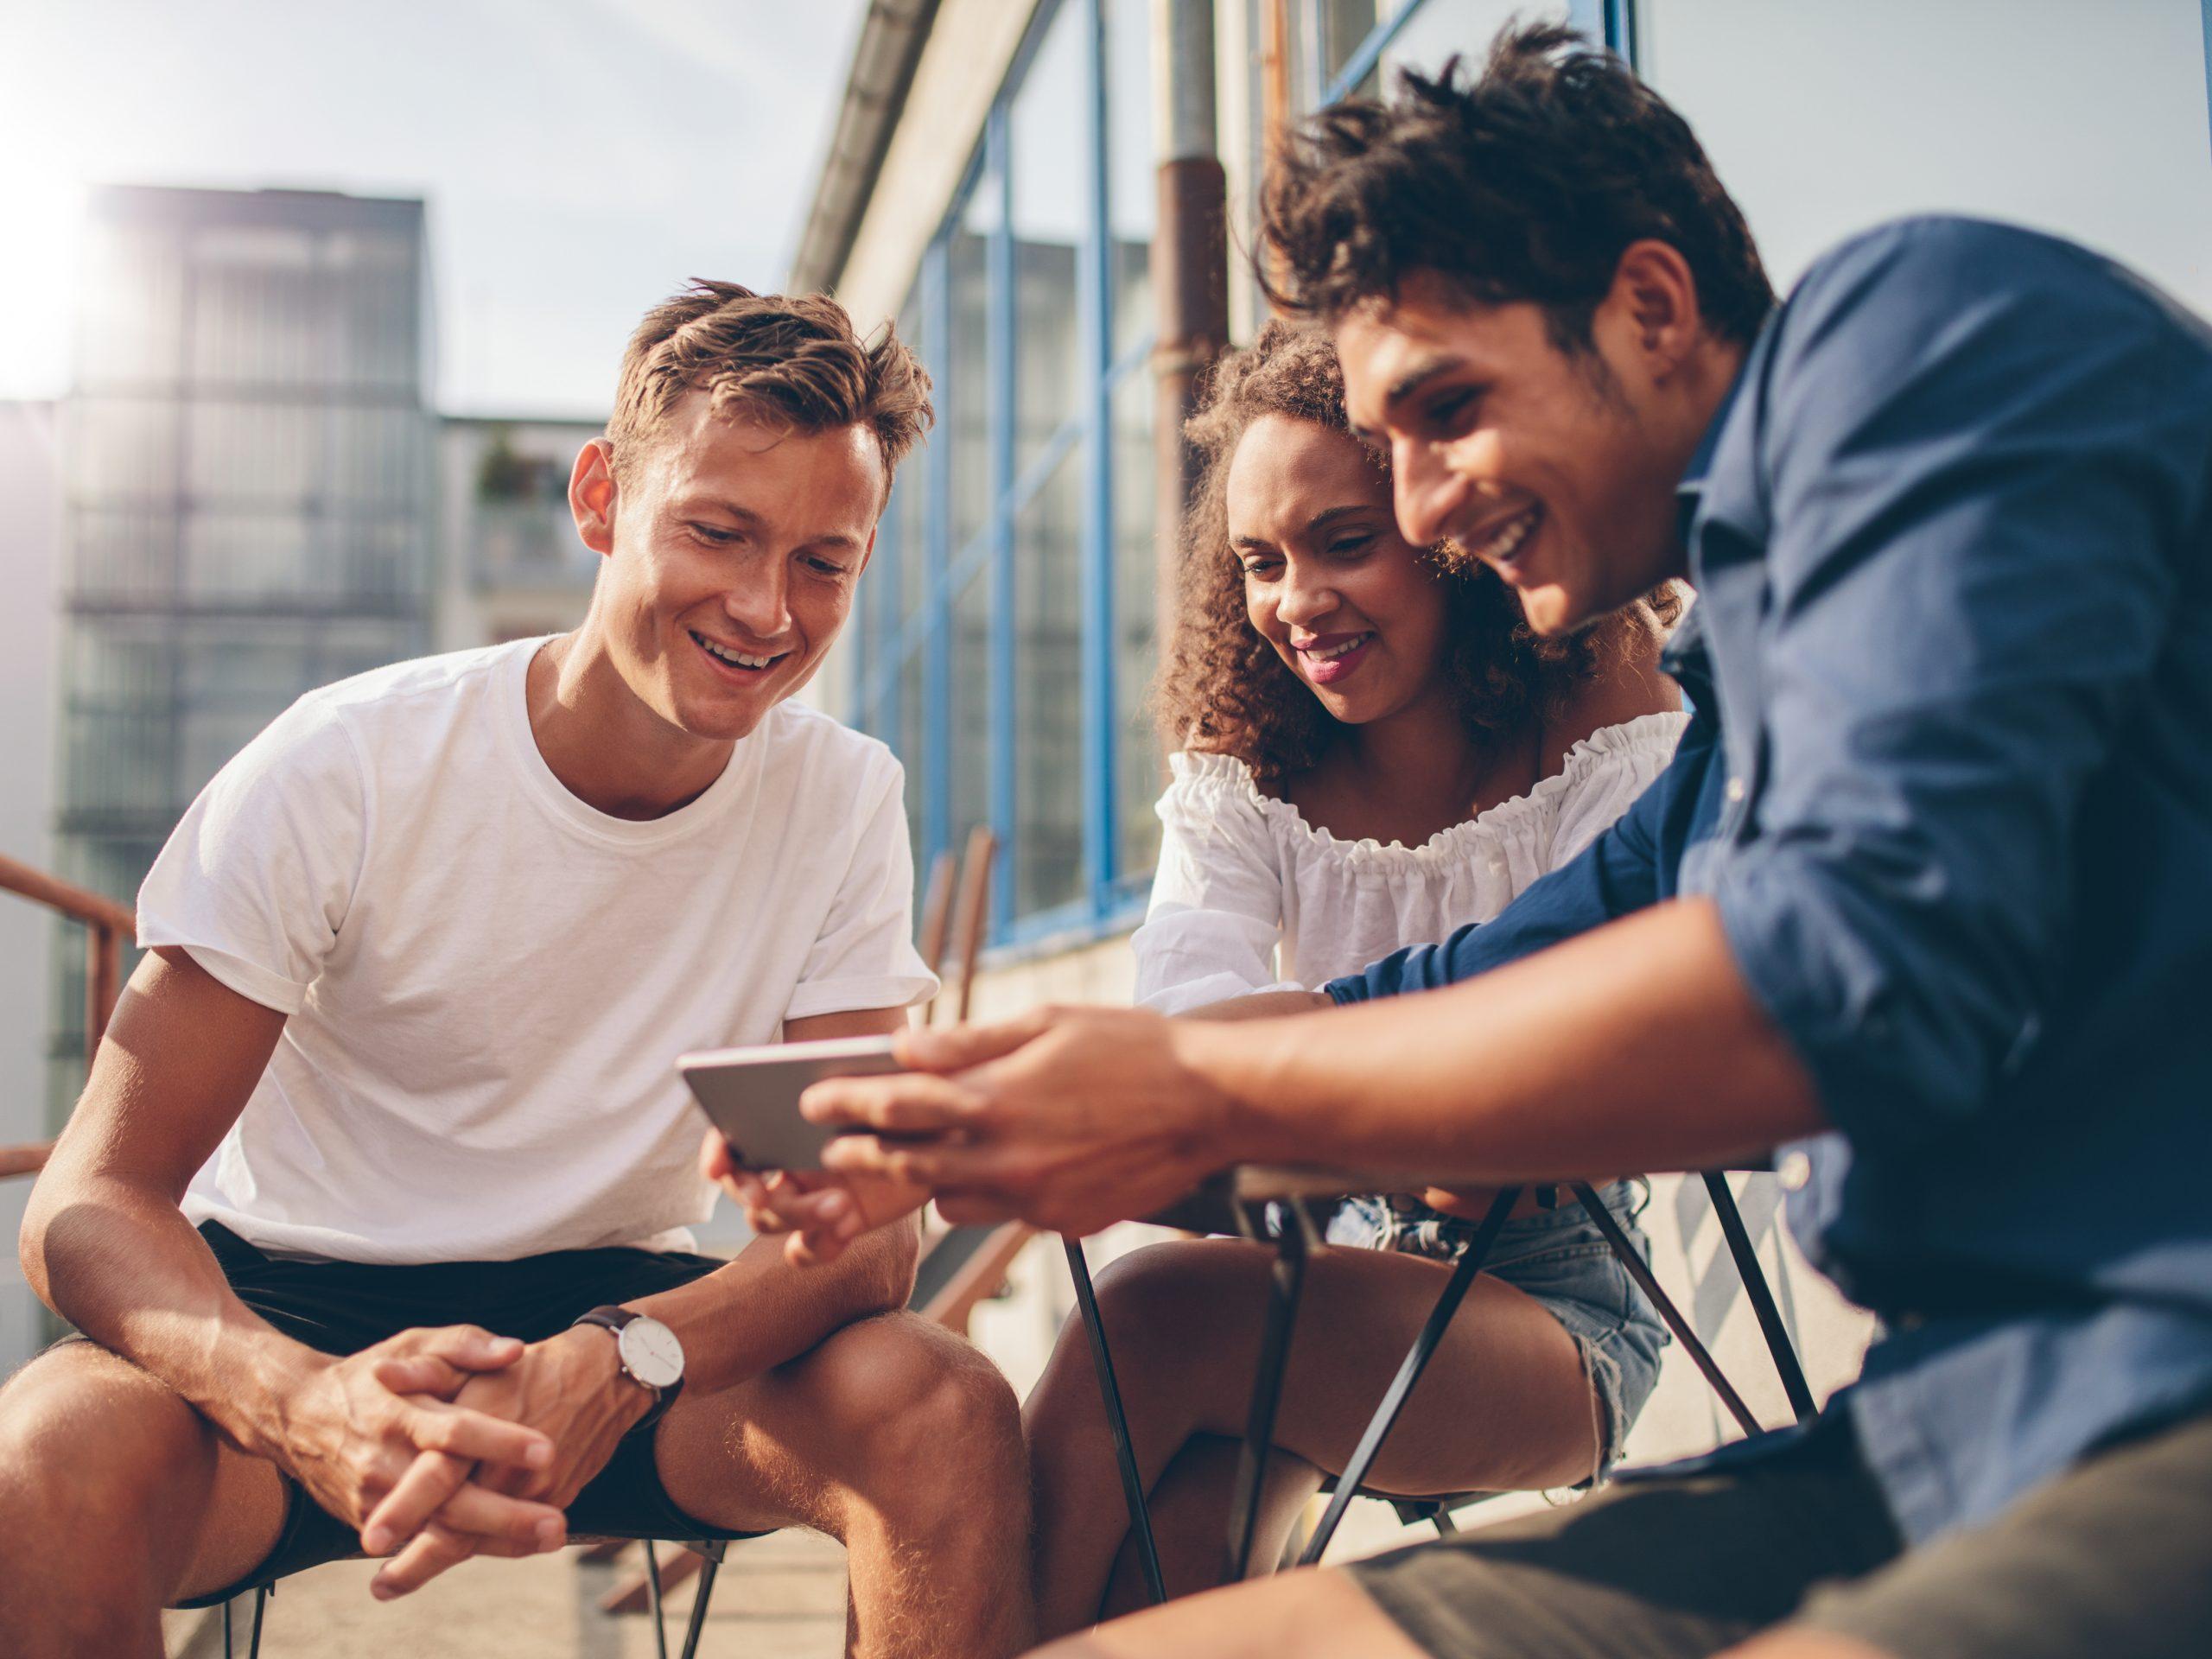 Social Video Marketing Strategies for Student Housing